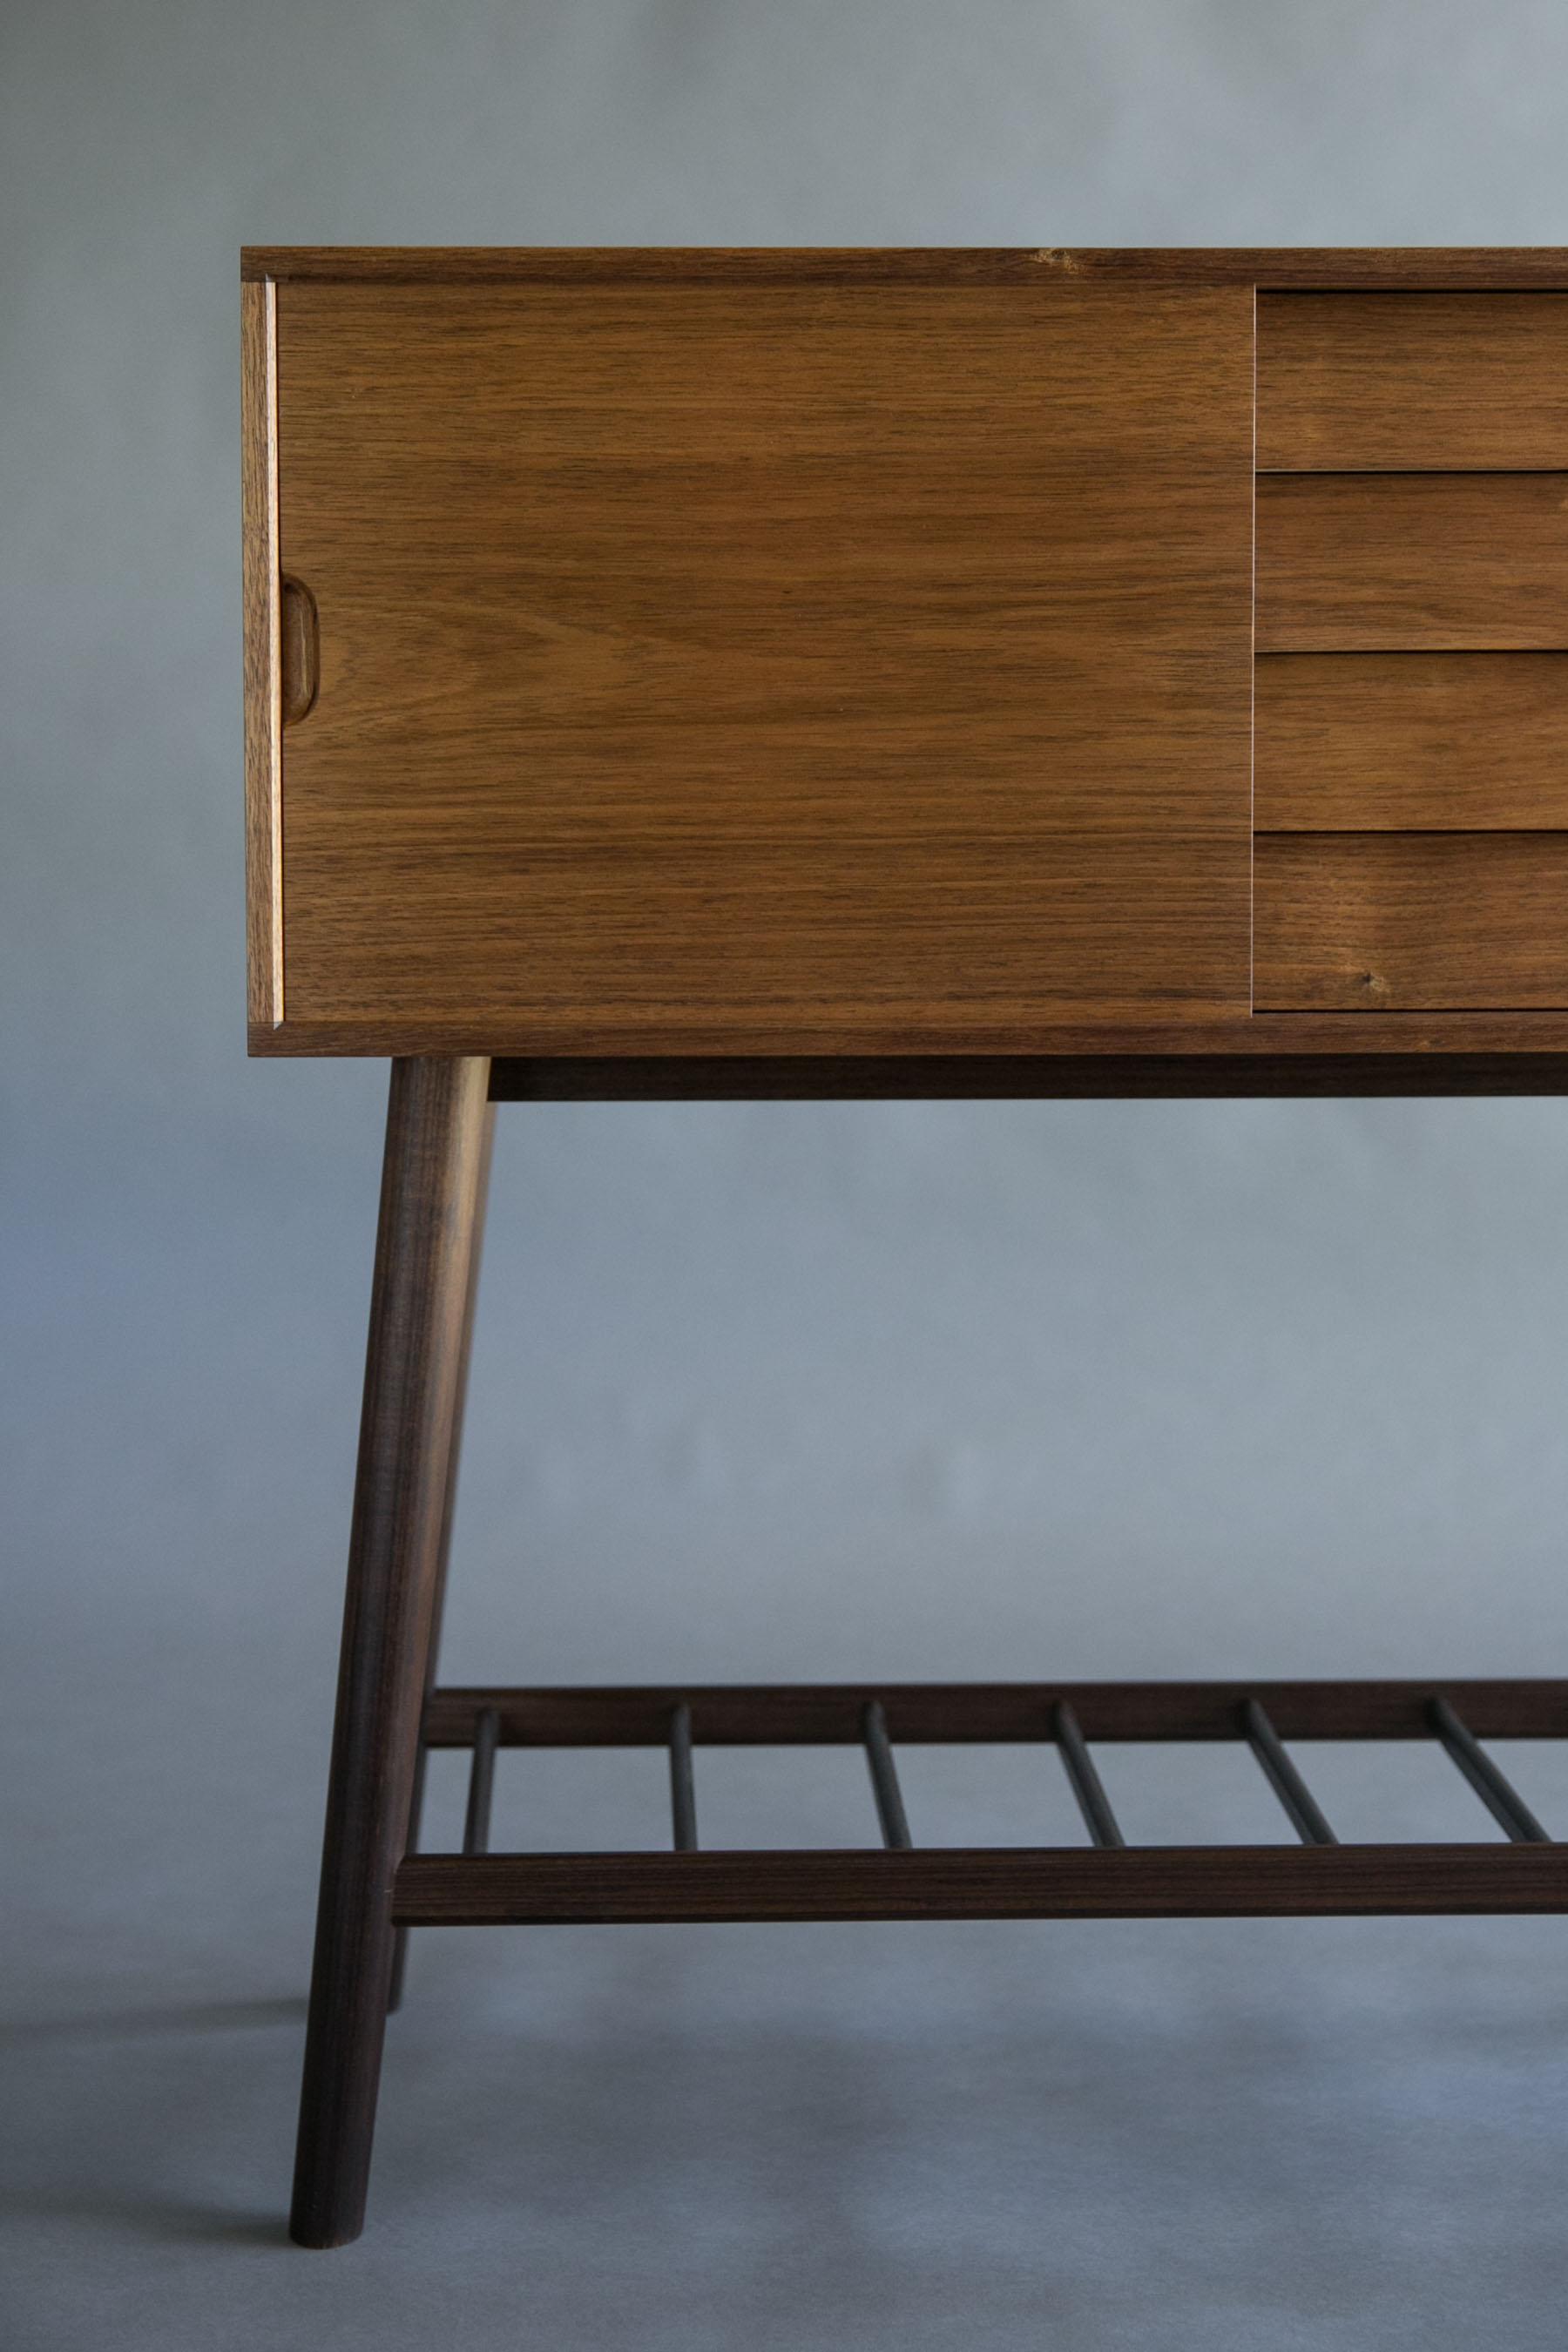 Reuben-Sturt-Furniture-2.jpg